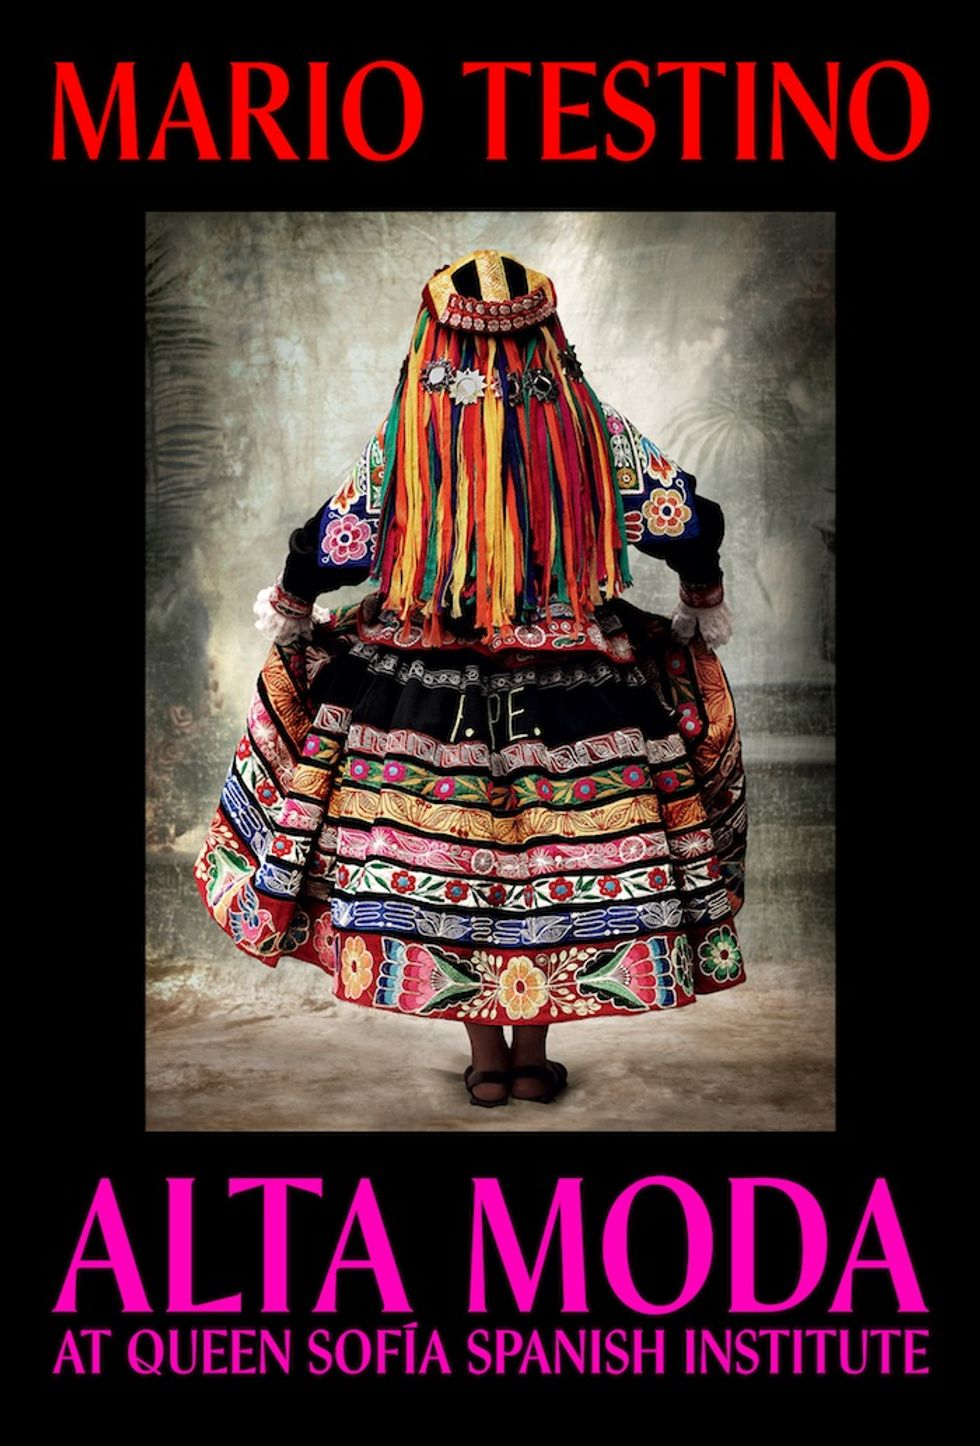 Check Out Stunning Photos from Mario Testino's New Exhibit, Alta Moda